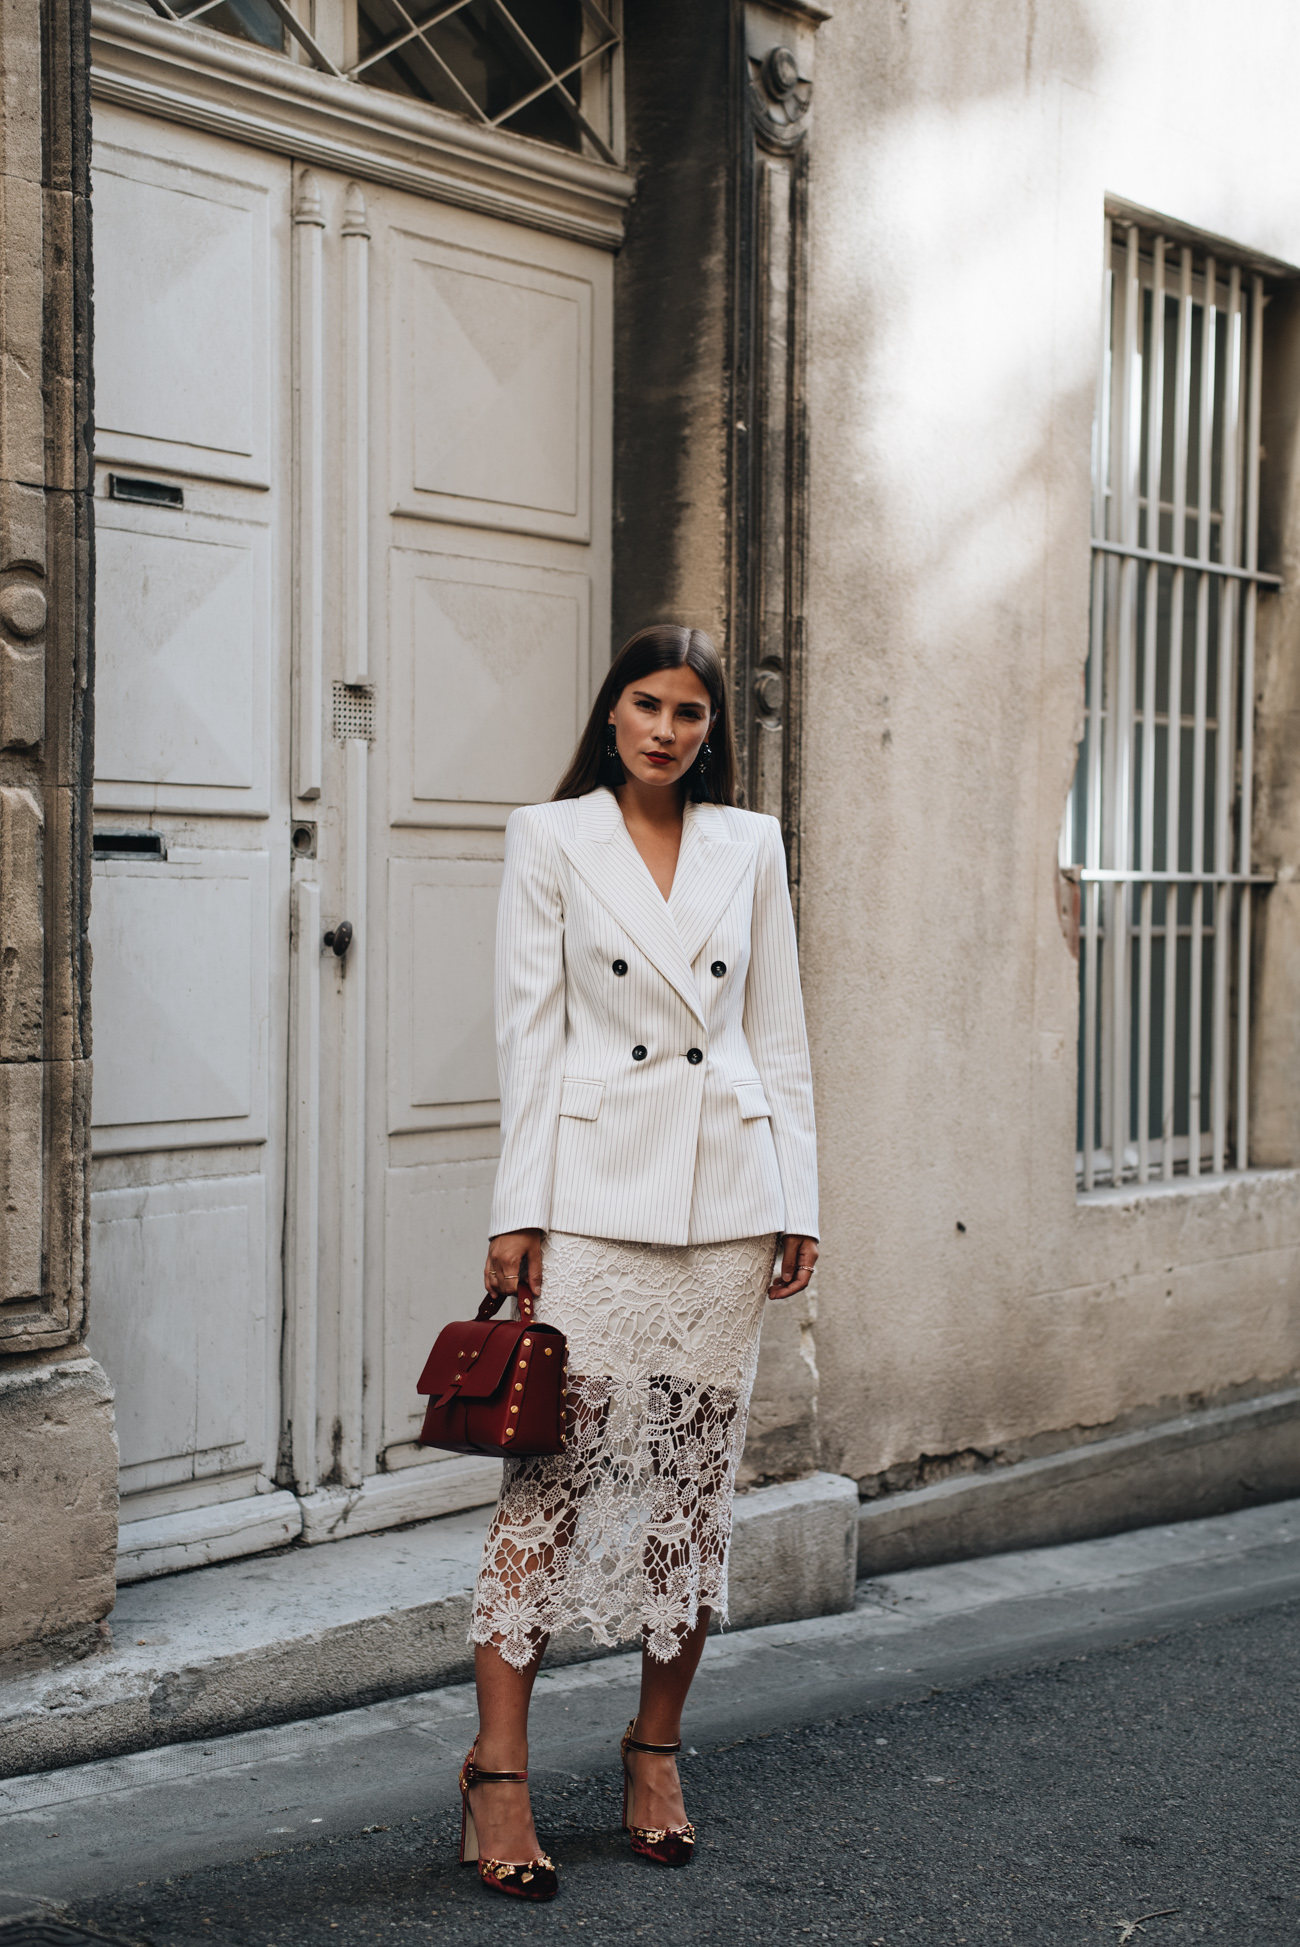 Dresscode Smart Casual